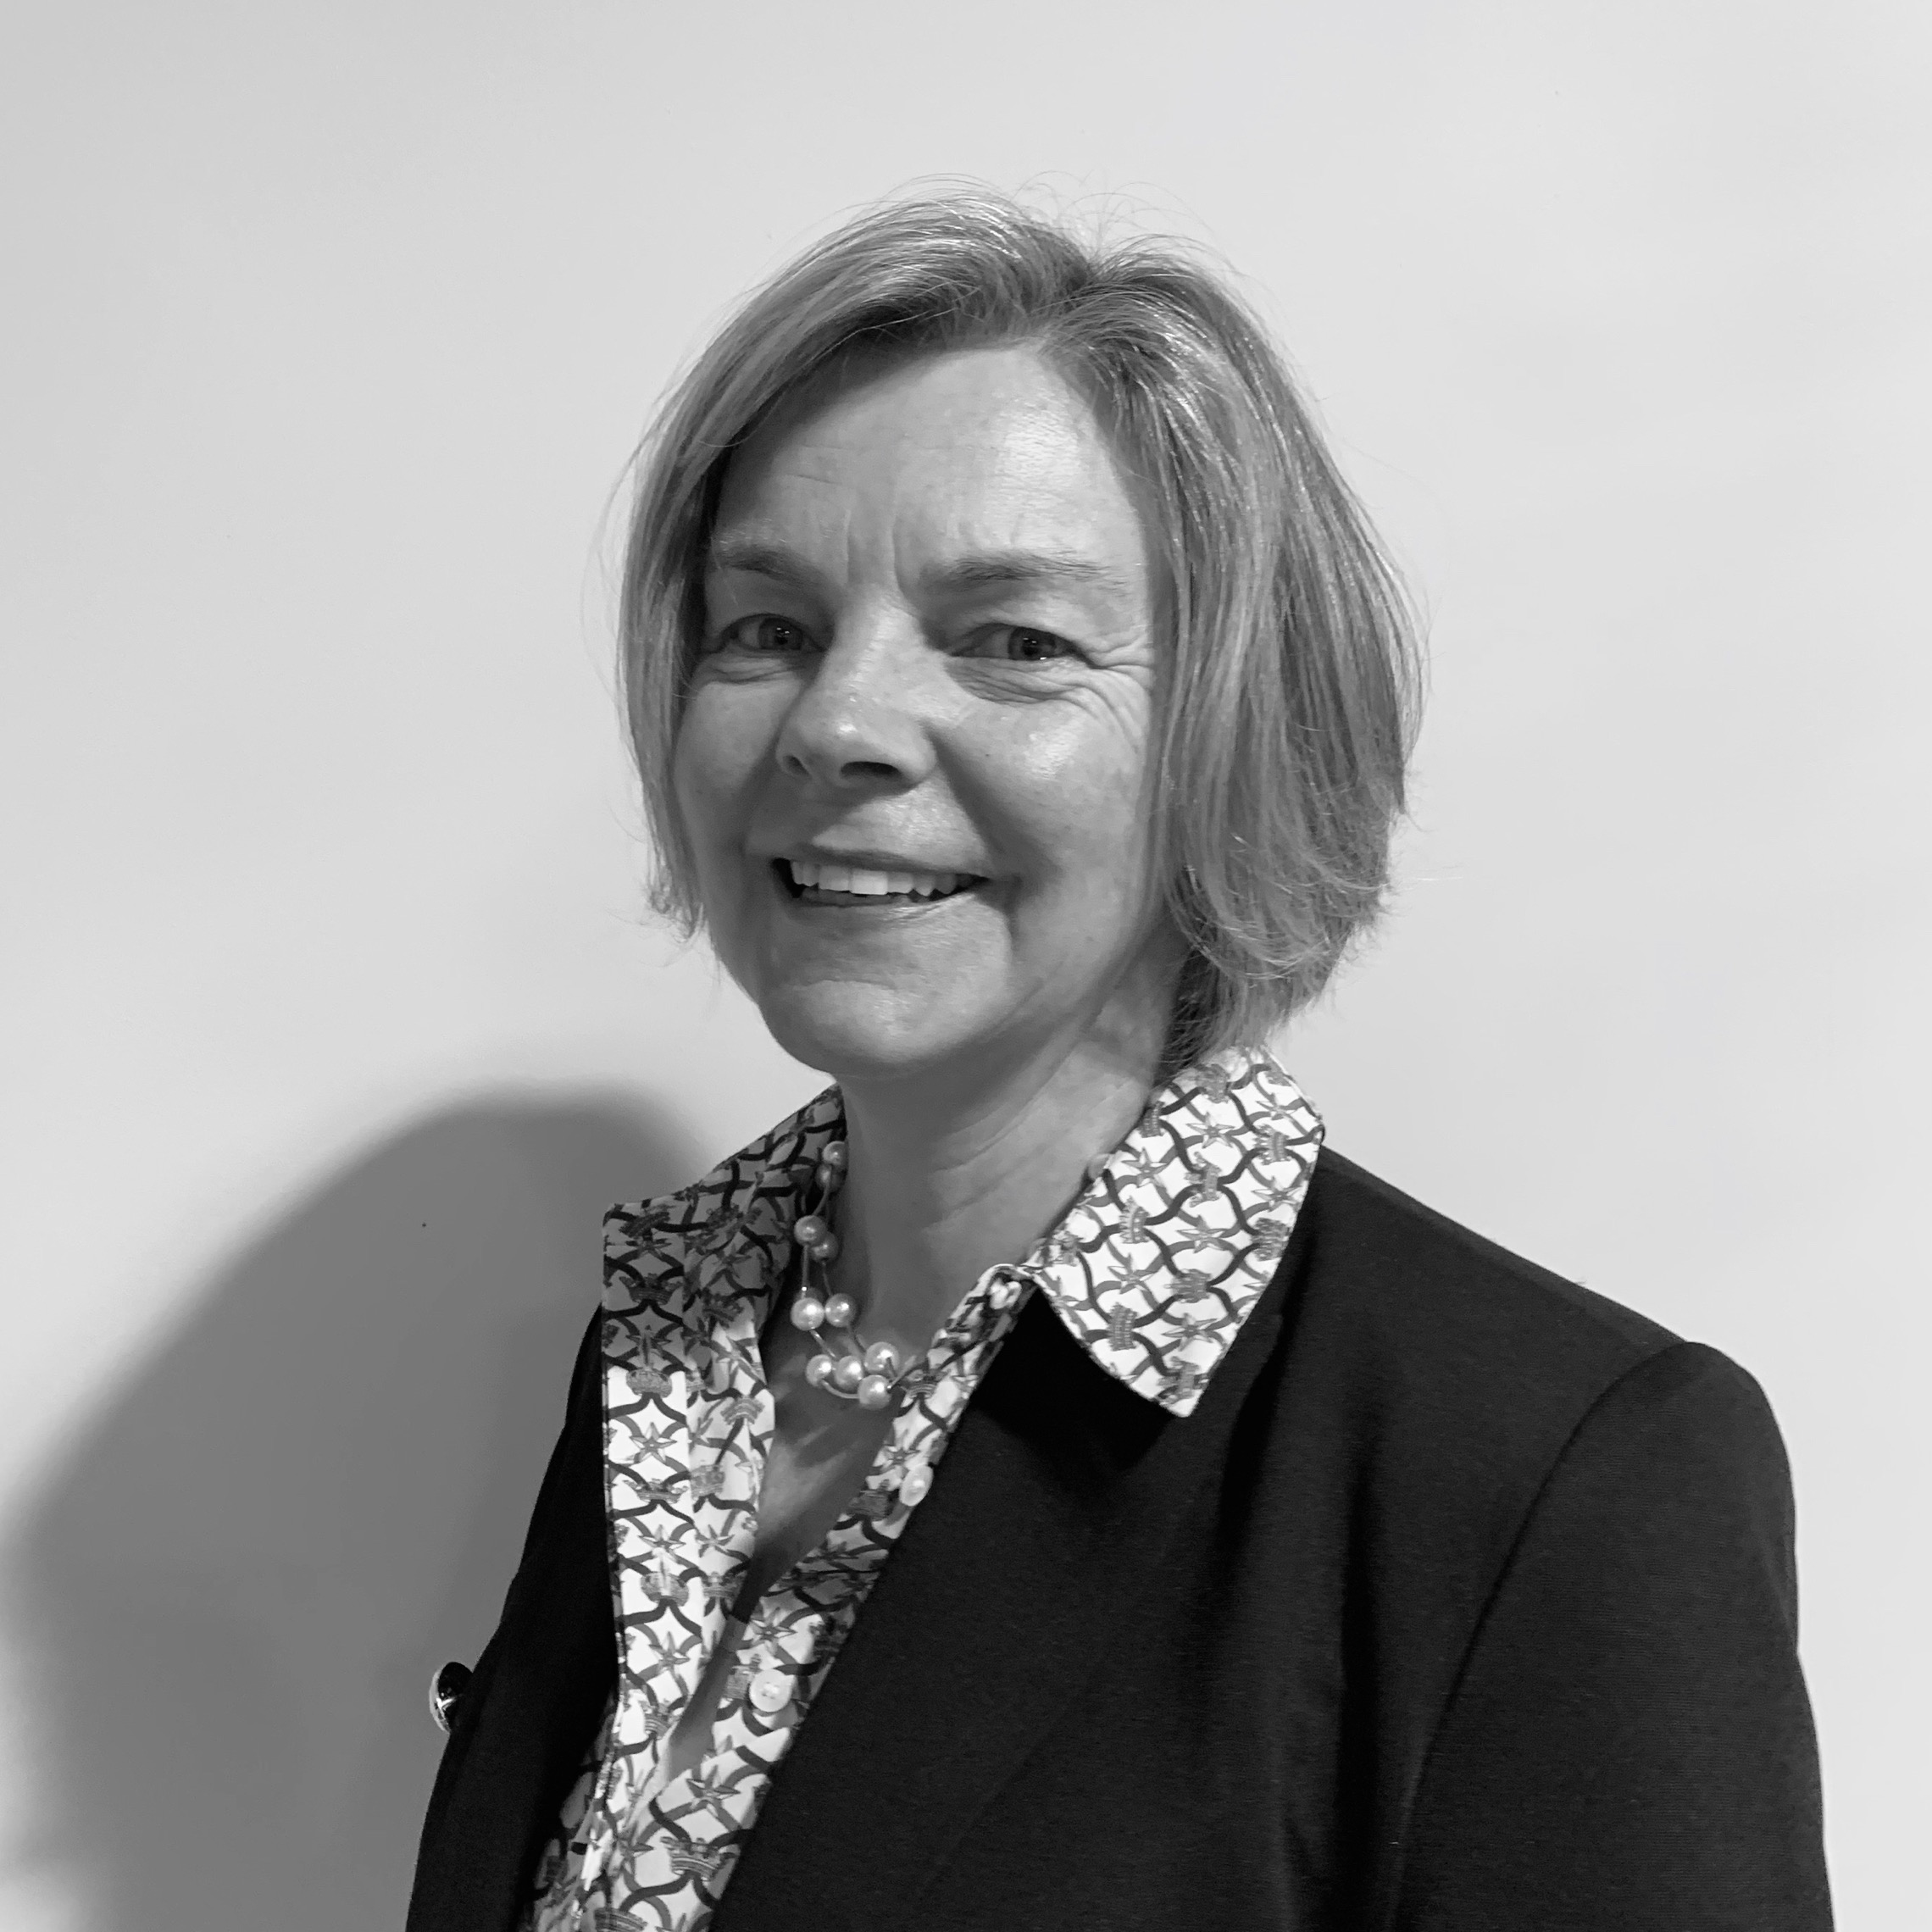 Nicolette Veltman